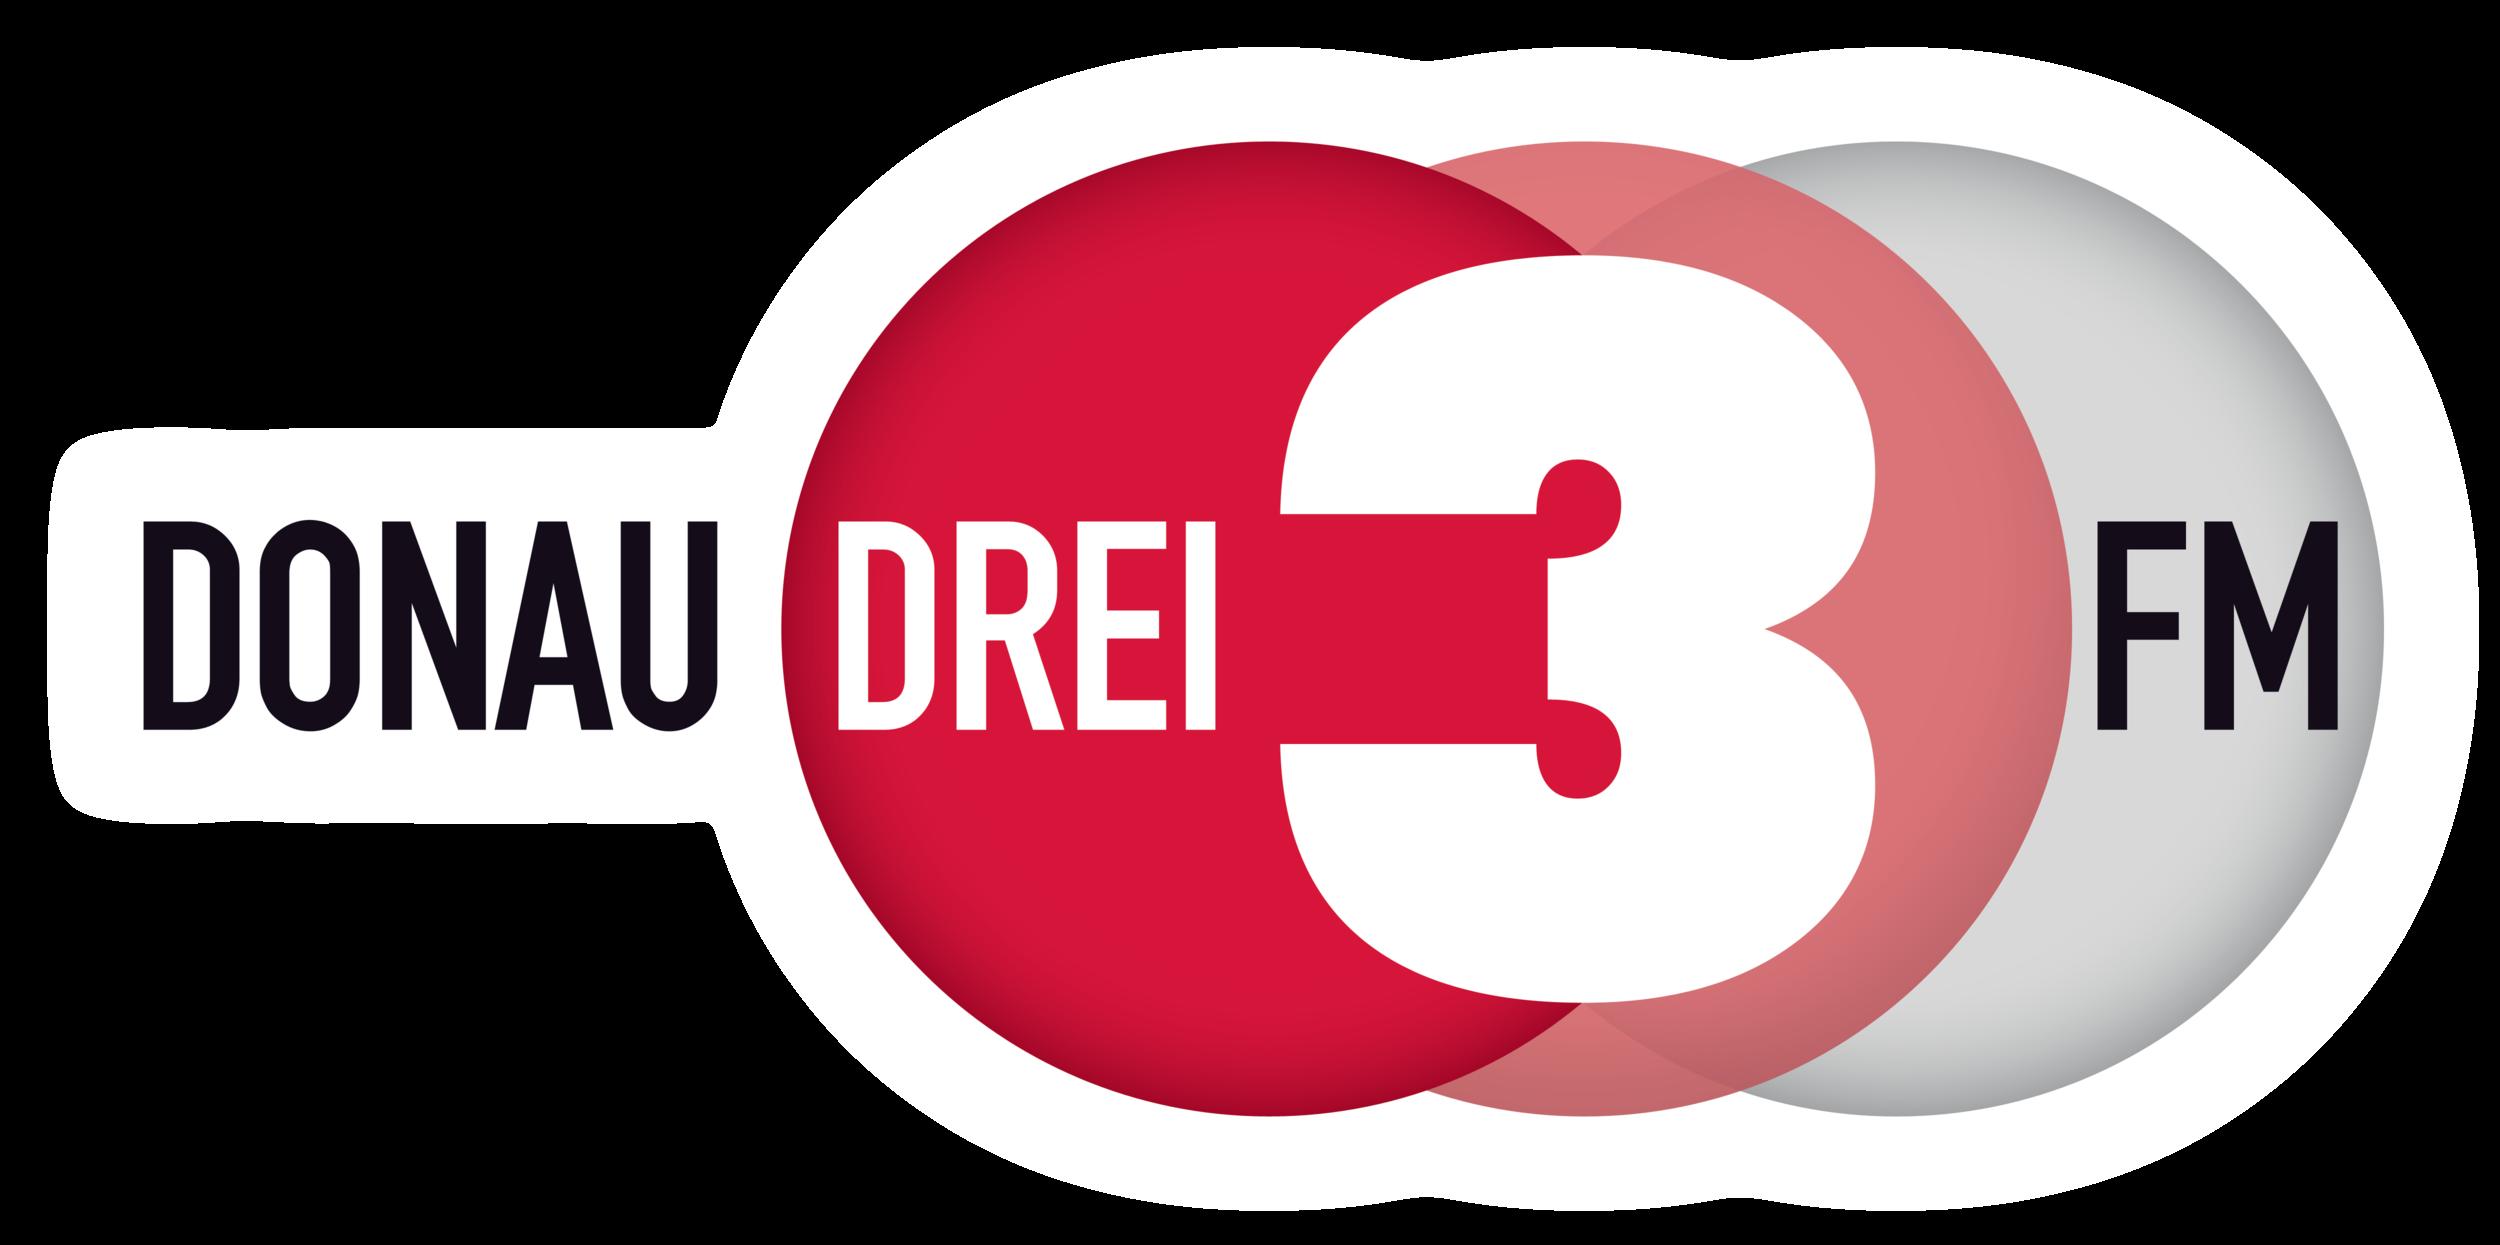 d3fm_logo_2012.png